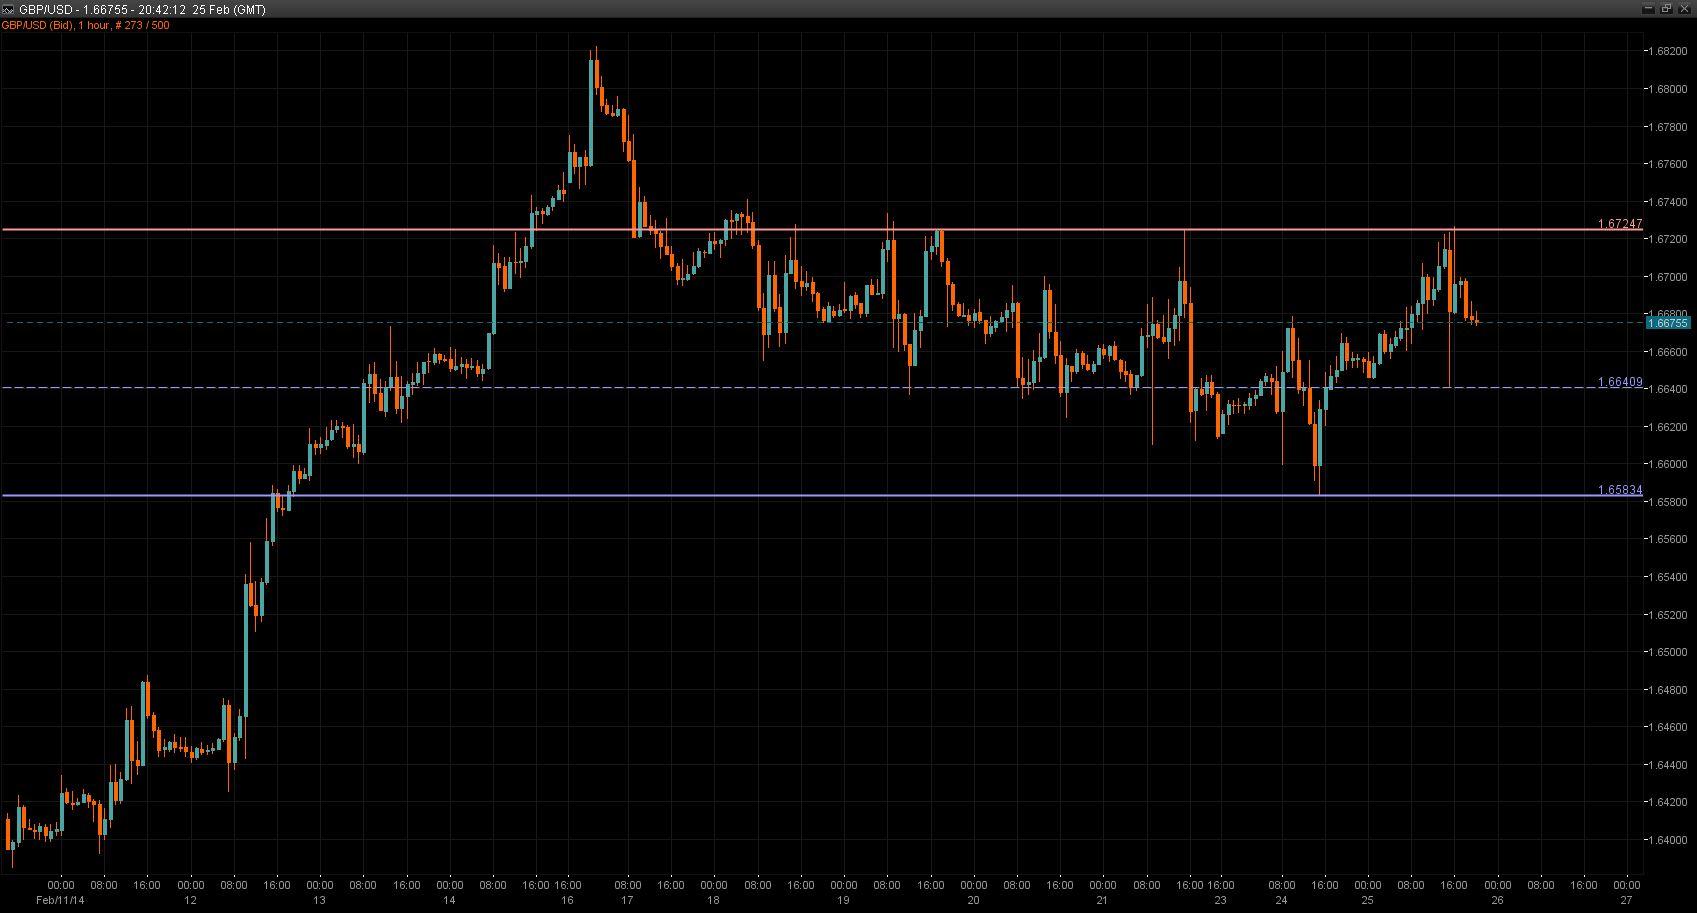 GBP/USD Chart 25 Feb 2014